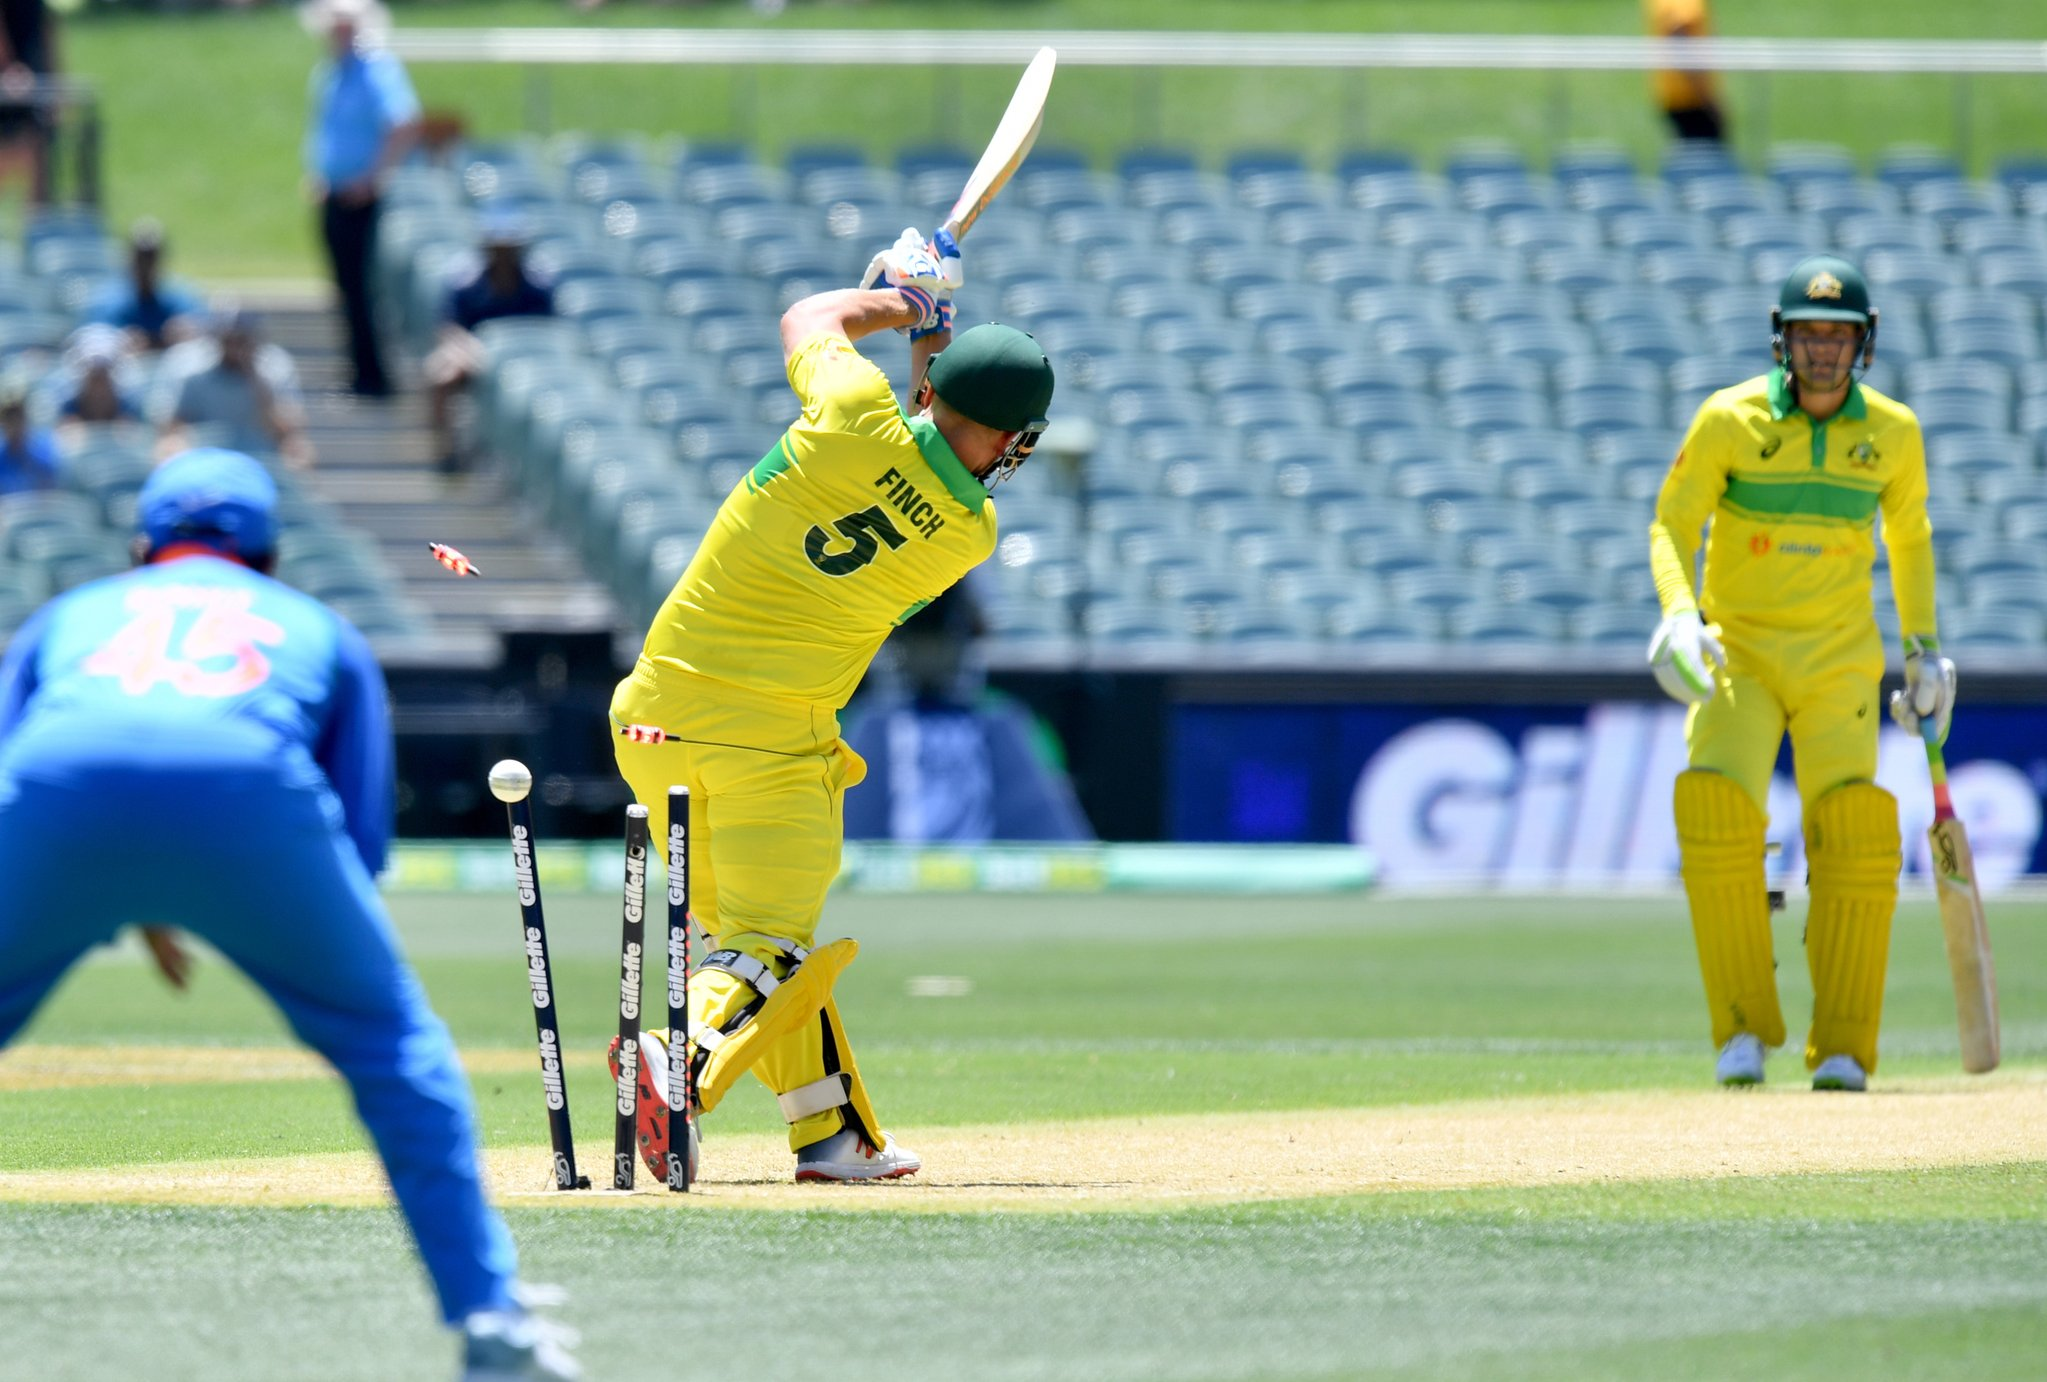 Aron finch wicket( image source: Twitter Handle)